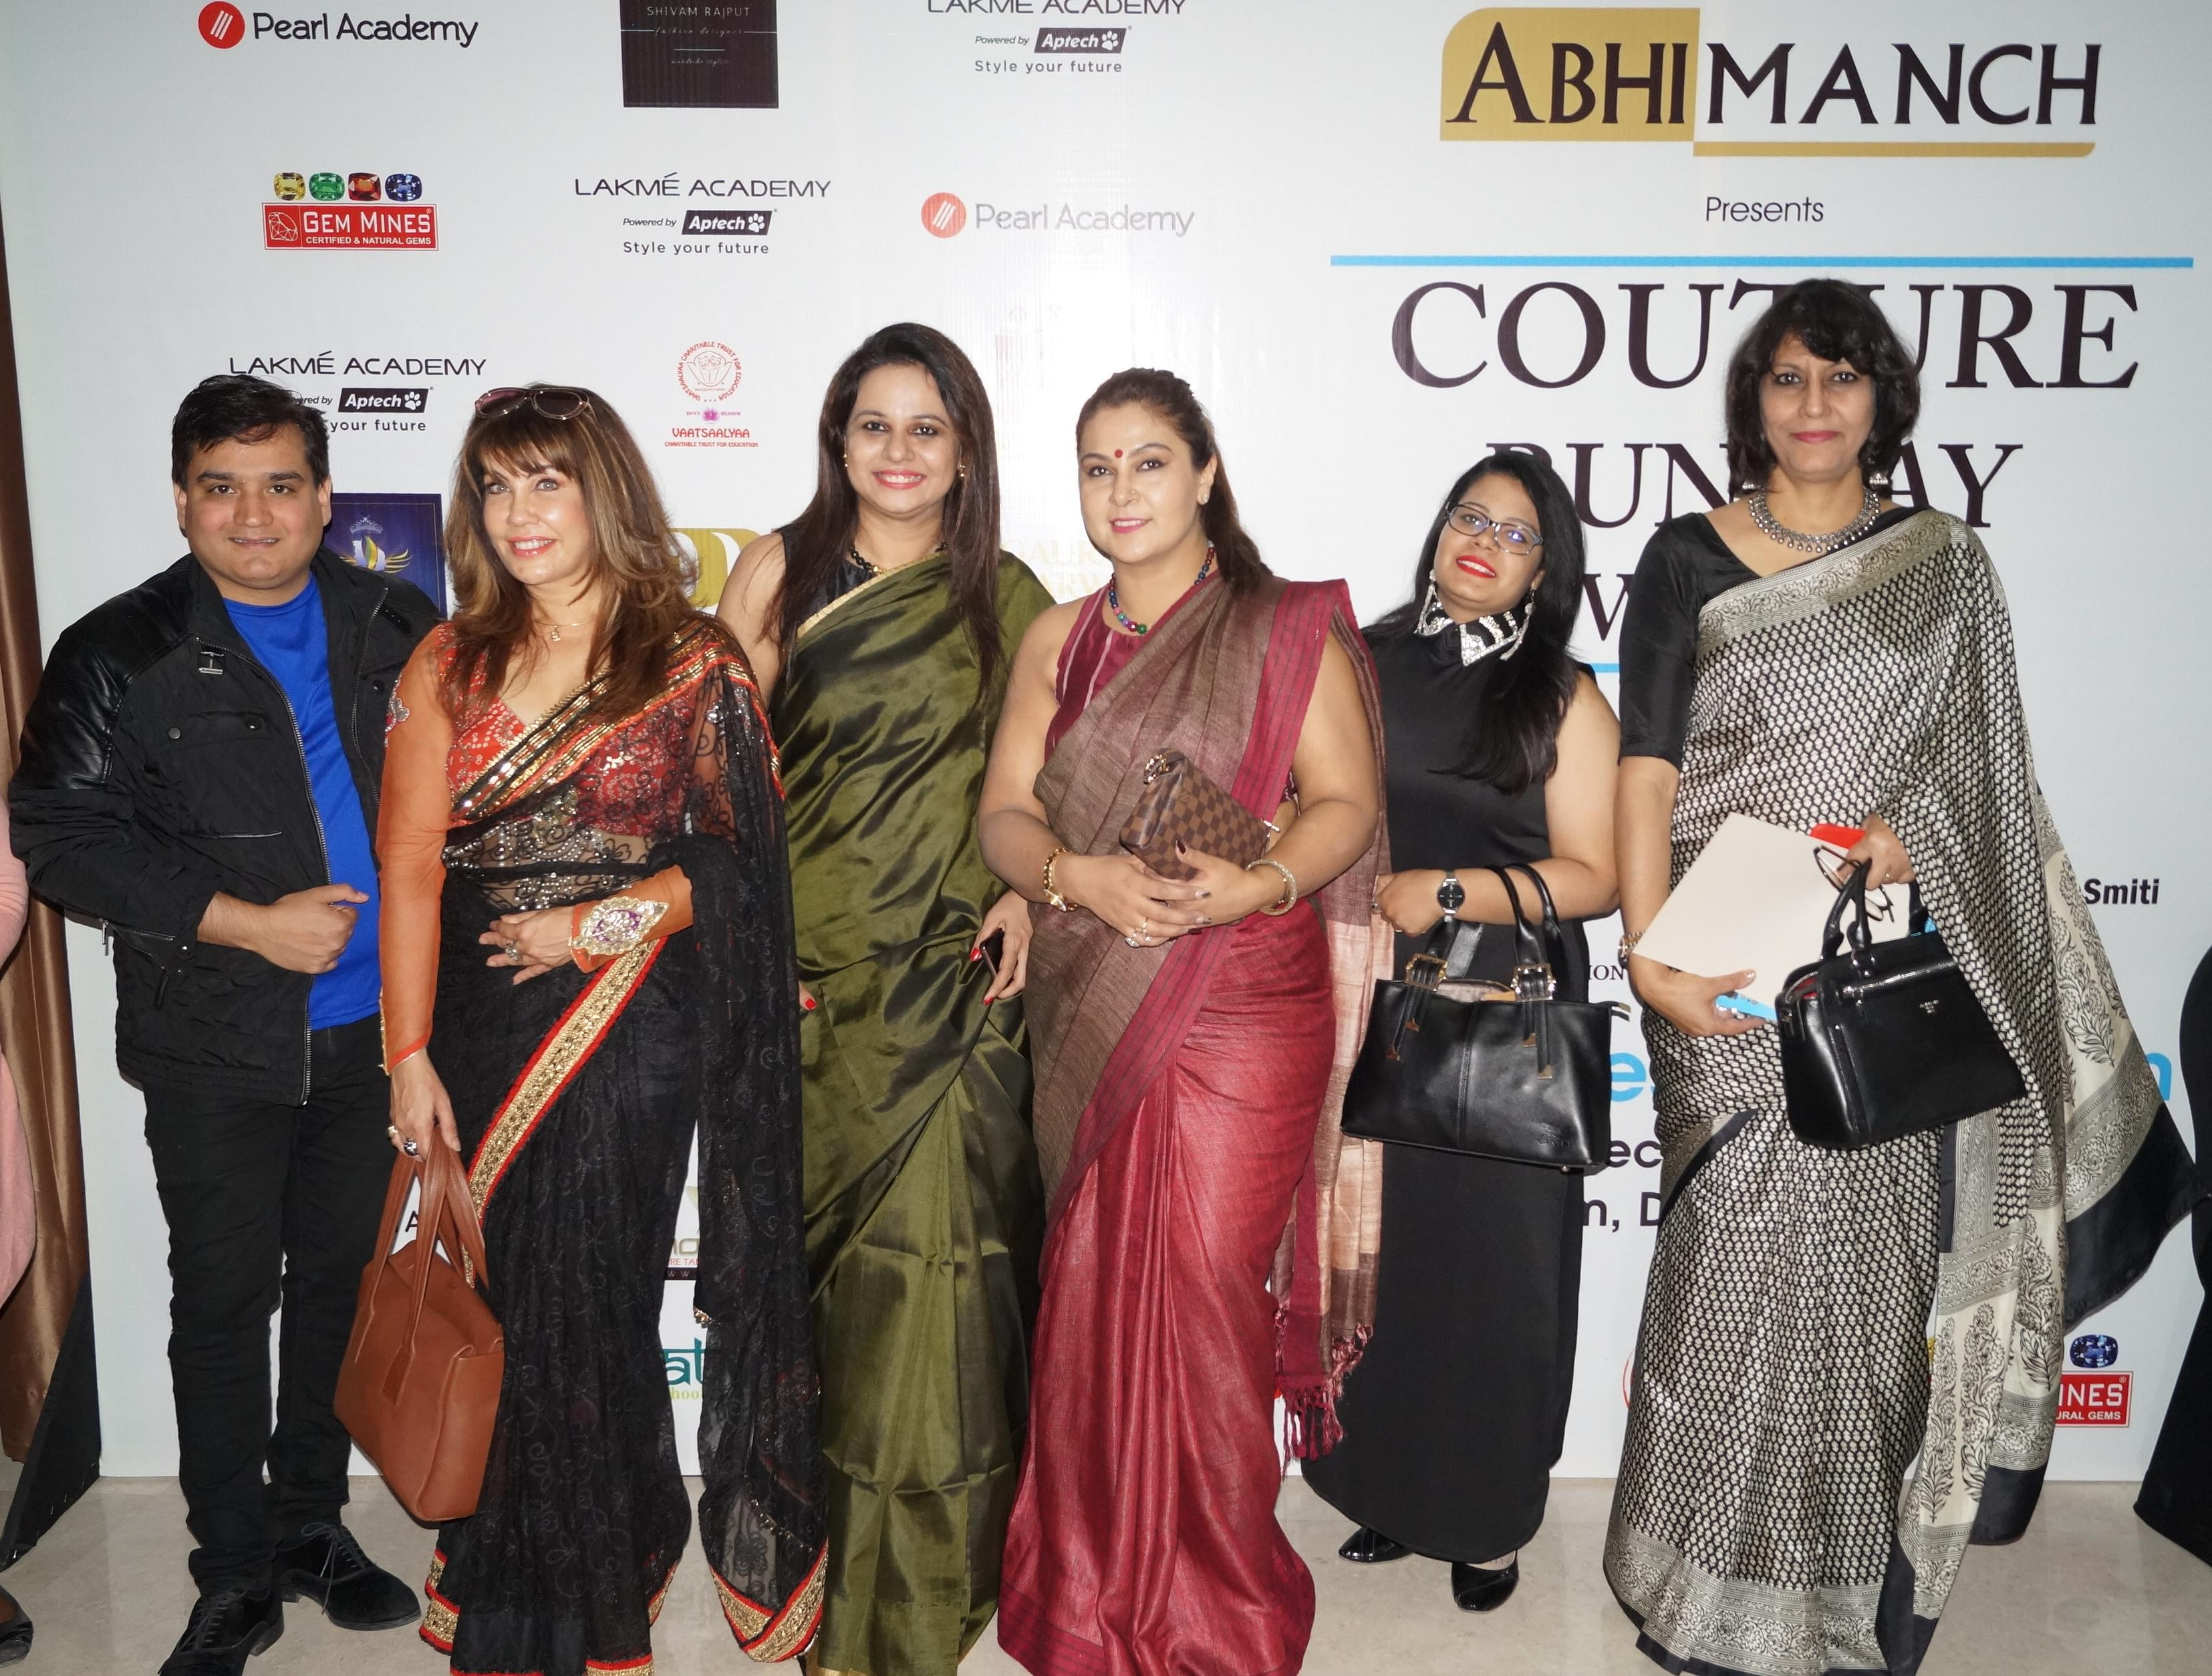 Tatyam School of Design, New Delhi - Images, Photos, Videos, Gallery